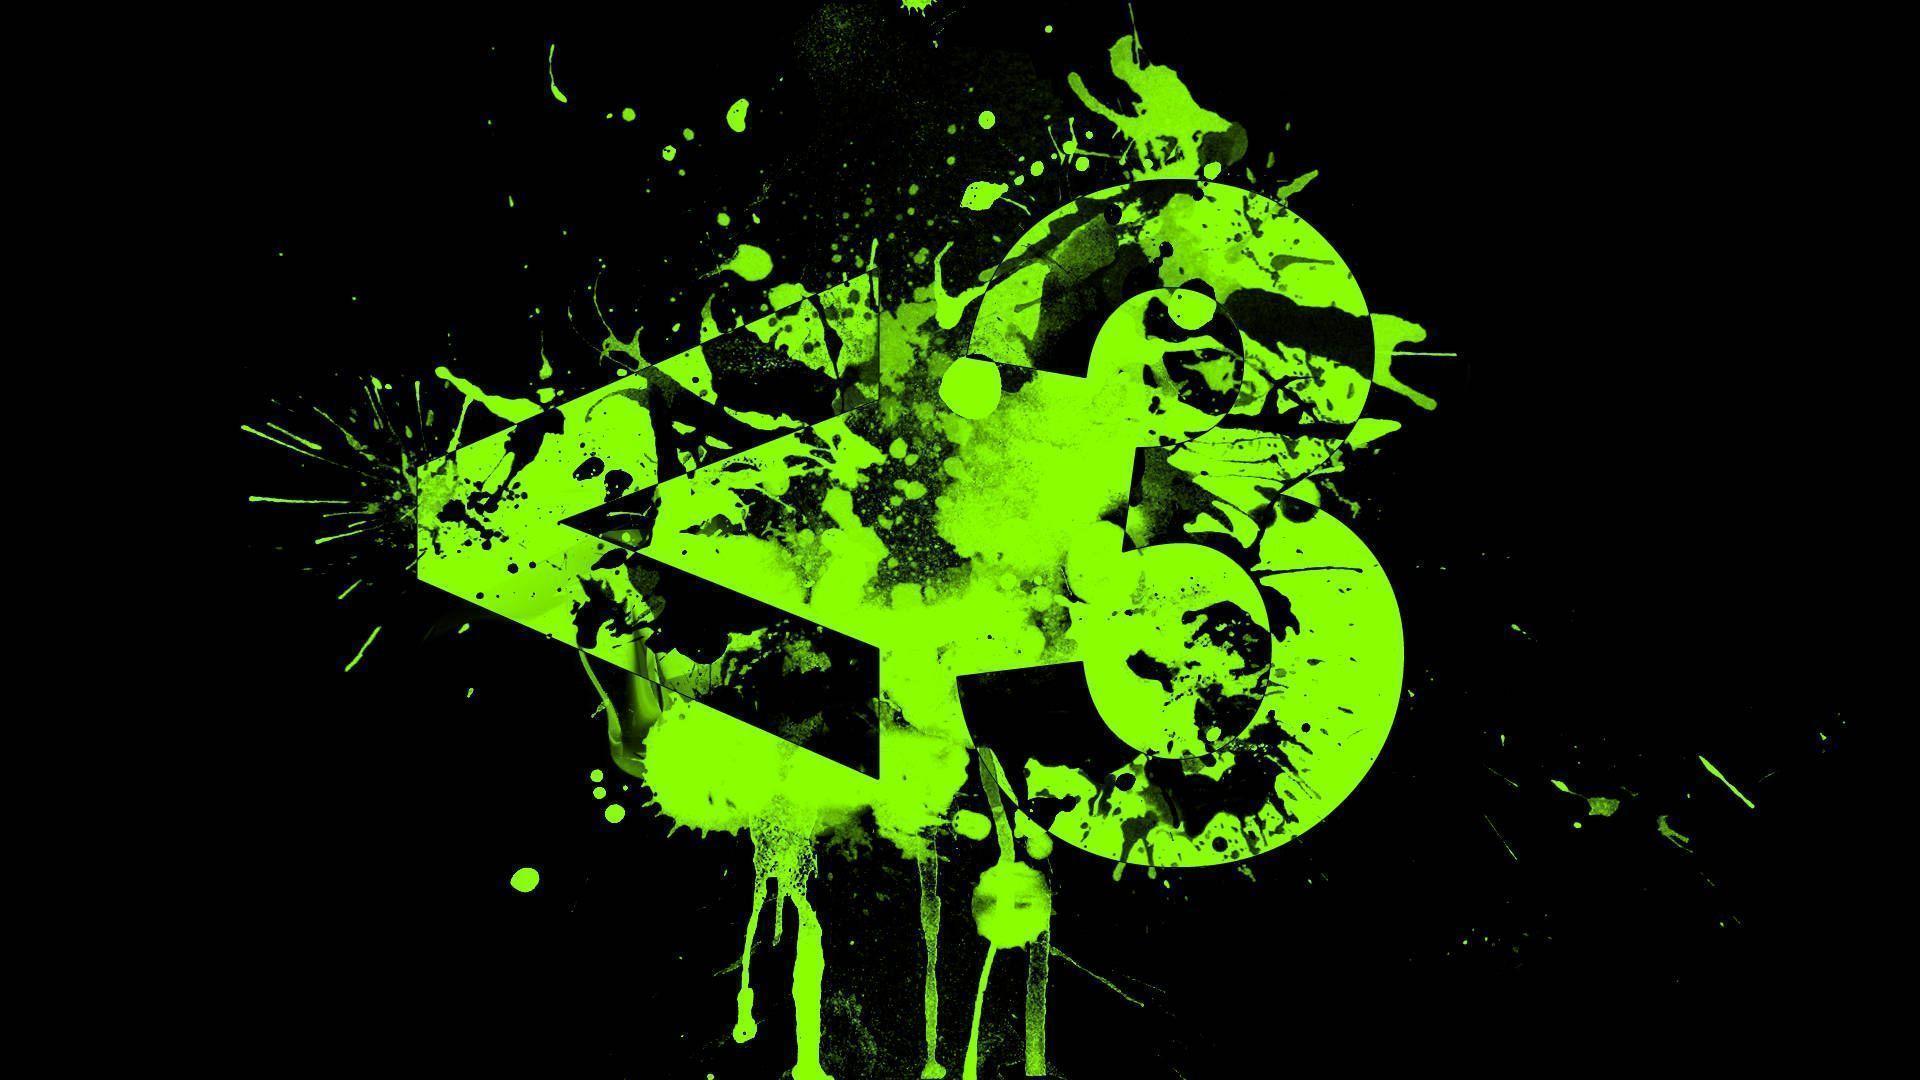 Black And Green Abstract Full Hd Wallpaper Wallpaper 384568